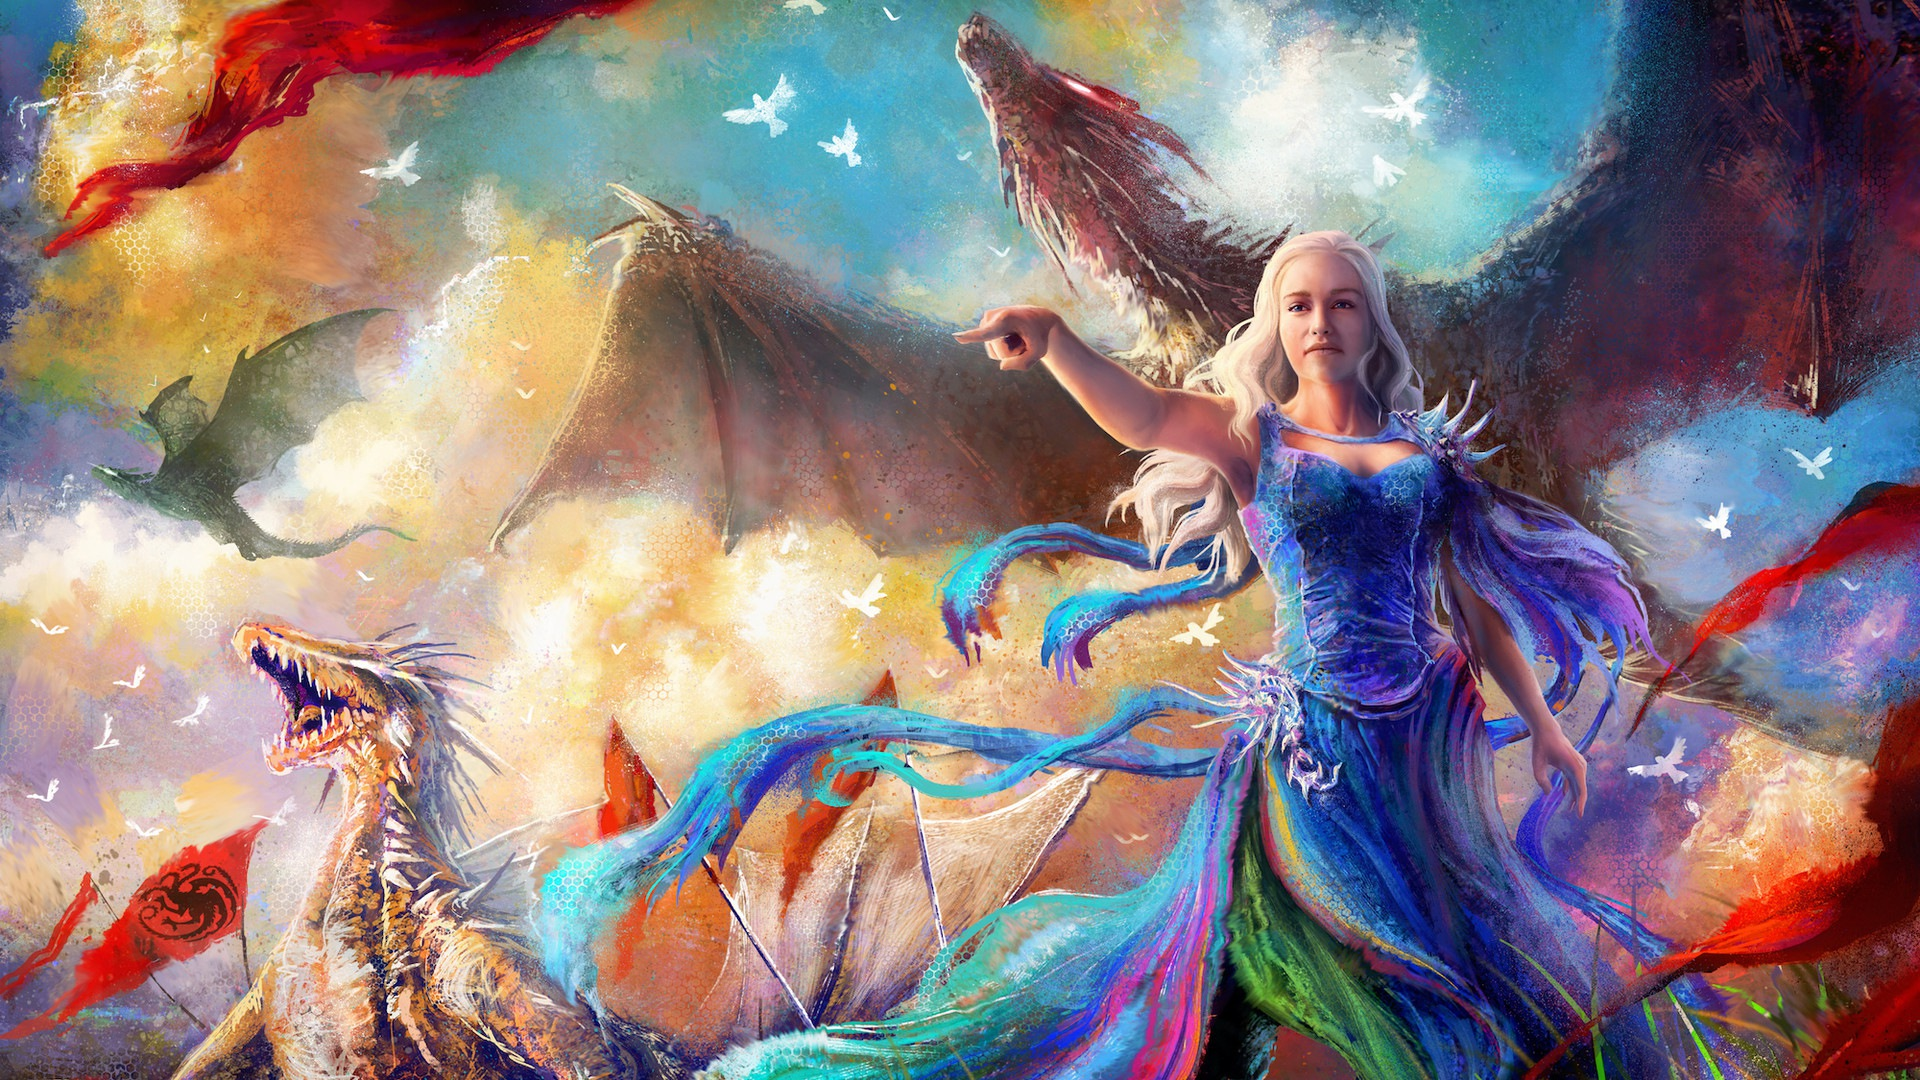 Wallpaper Game of thrones, daenerys, dragon, artwork